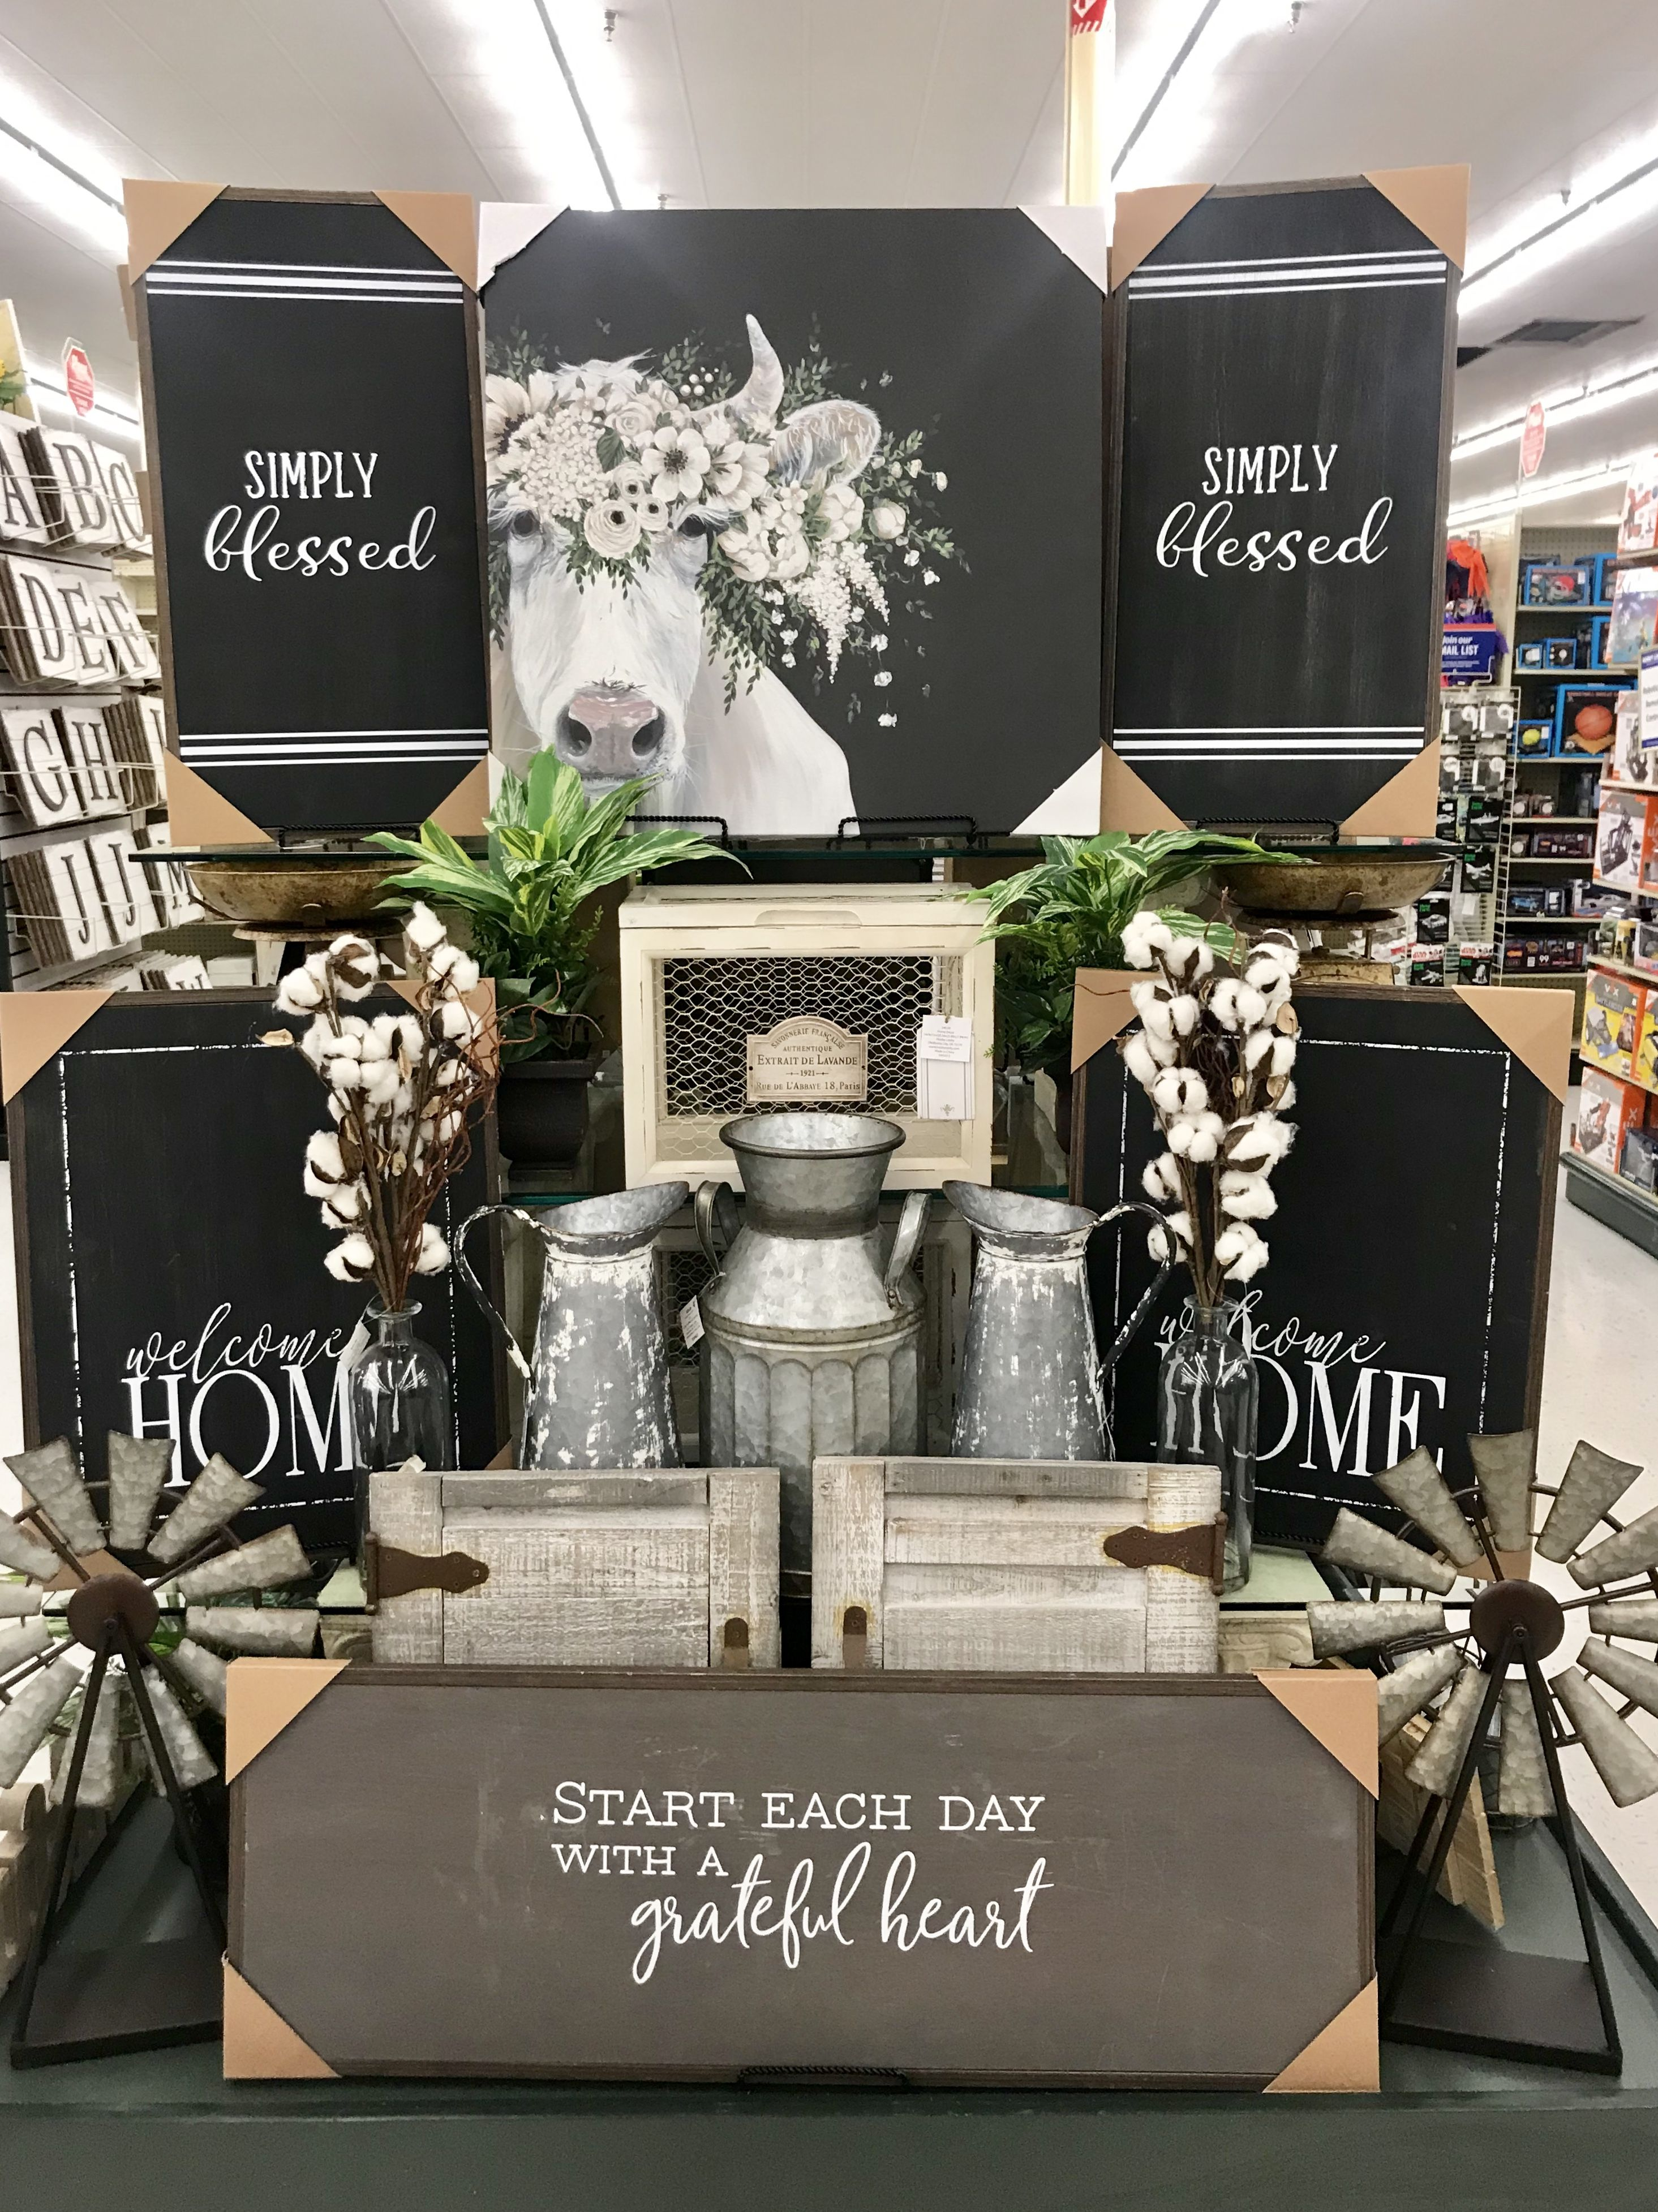 Hobby lobby merchandising table displays work/Kv   Hobby ...